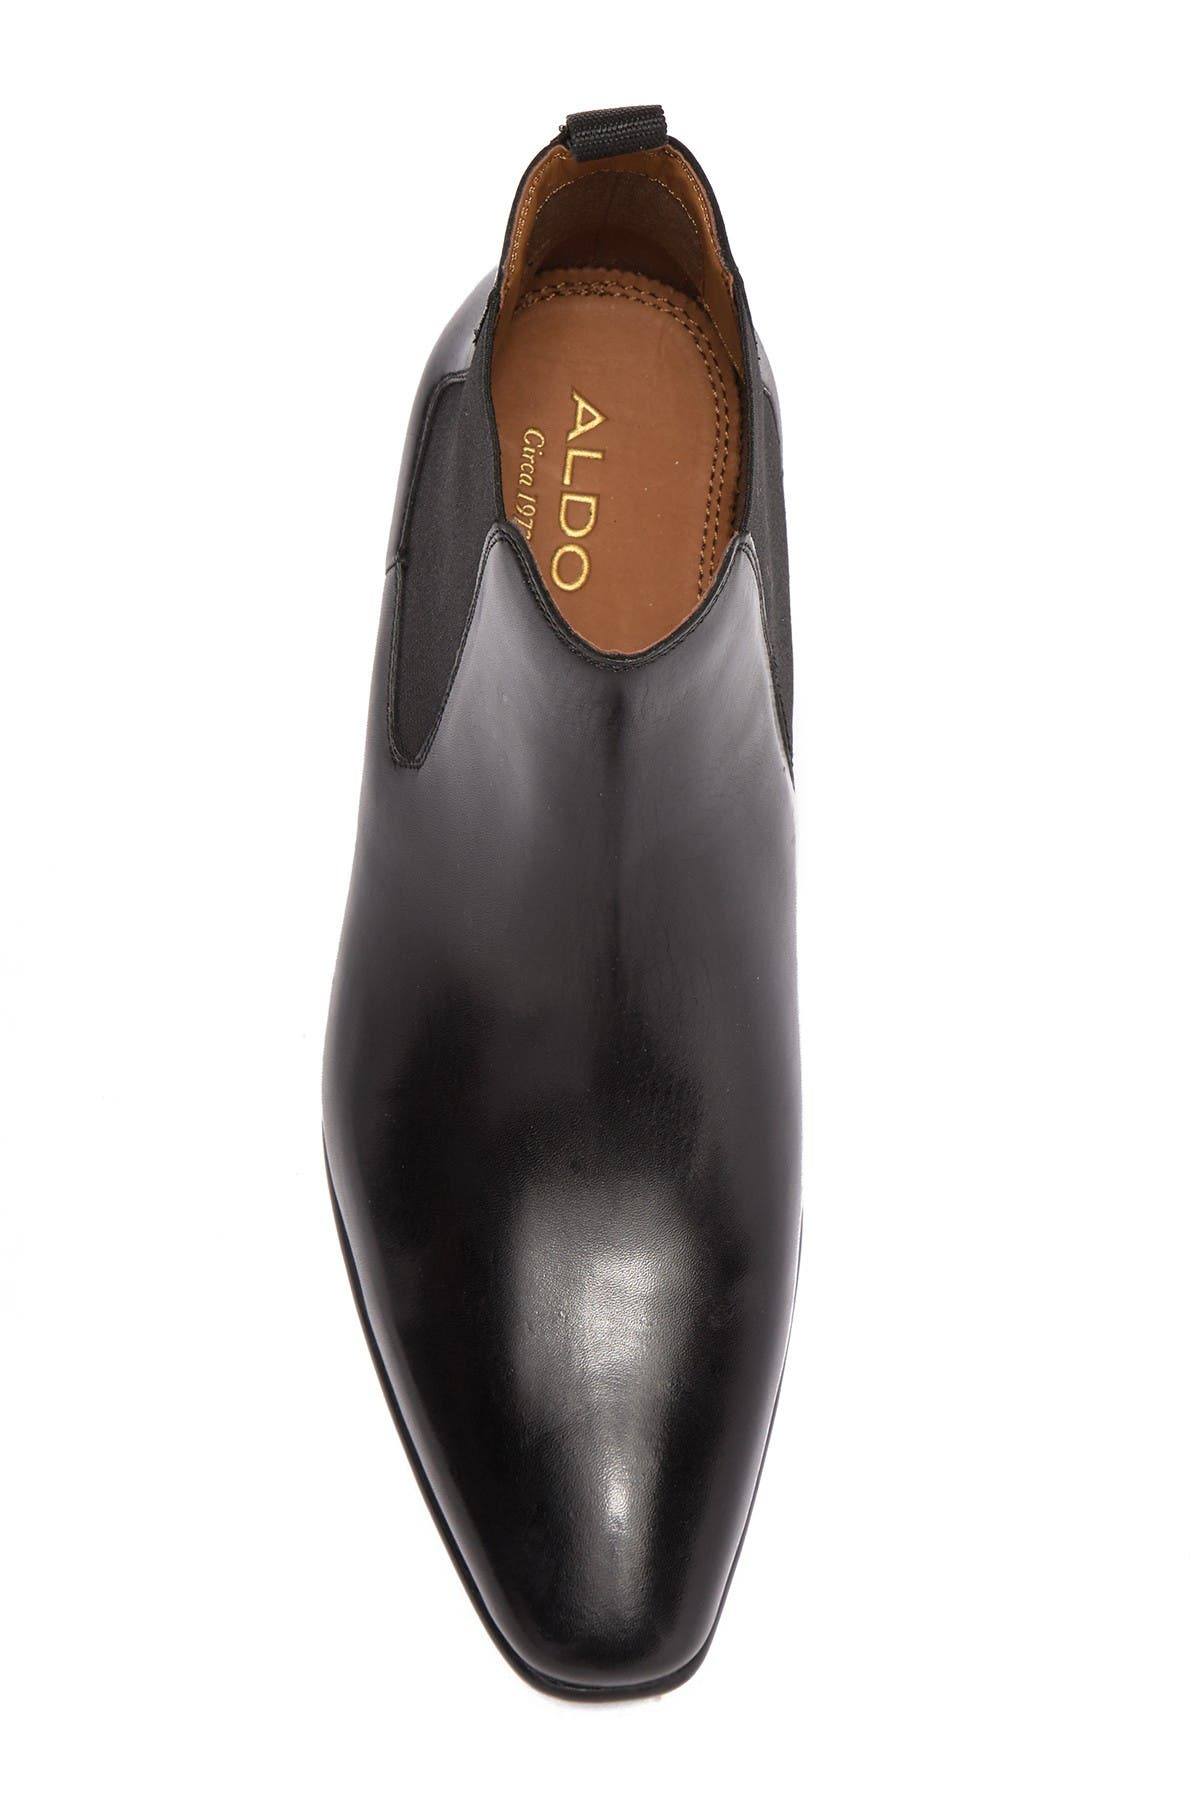 Aldo | Frelini Leather Chelsea Boot